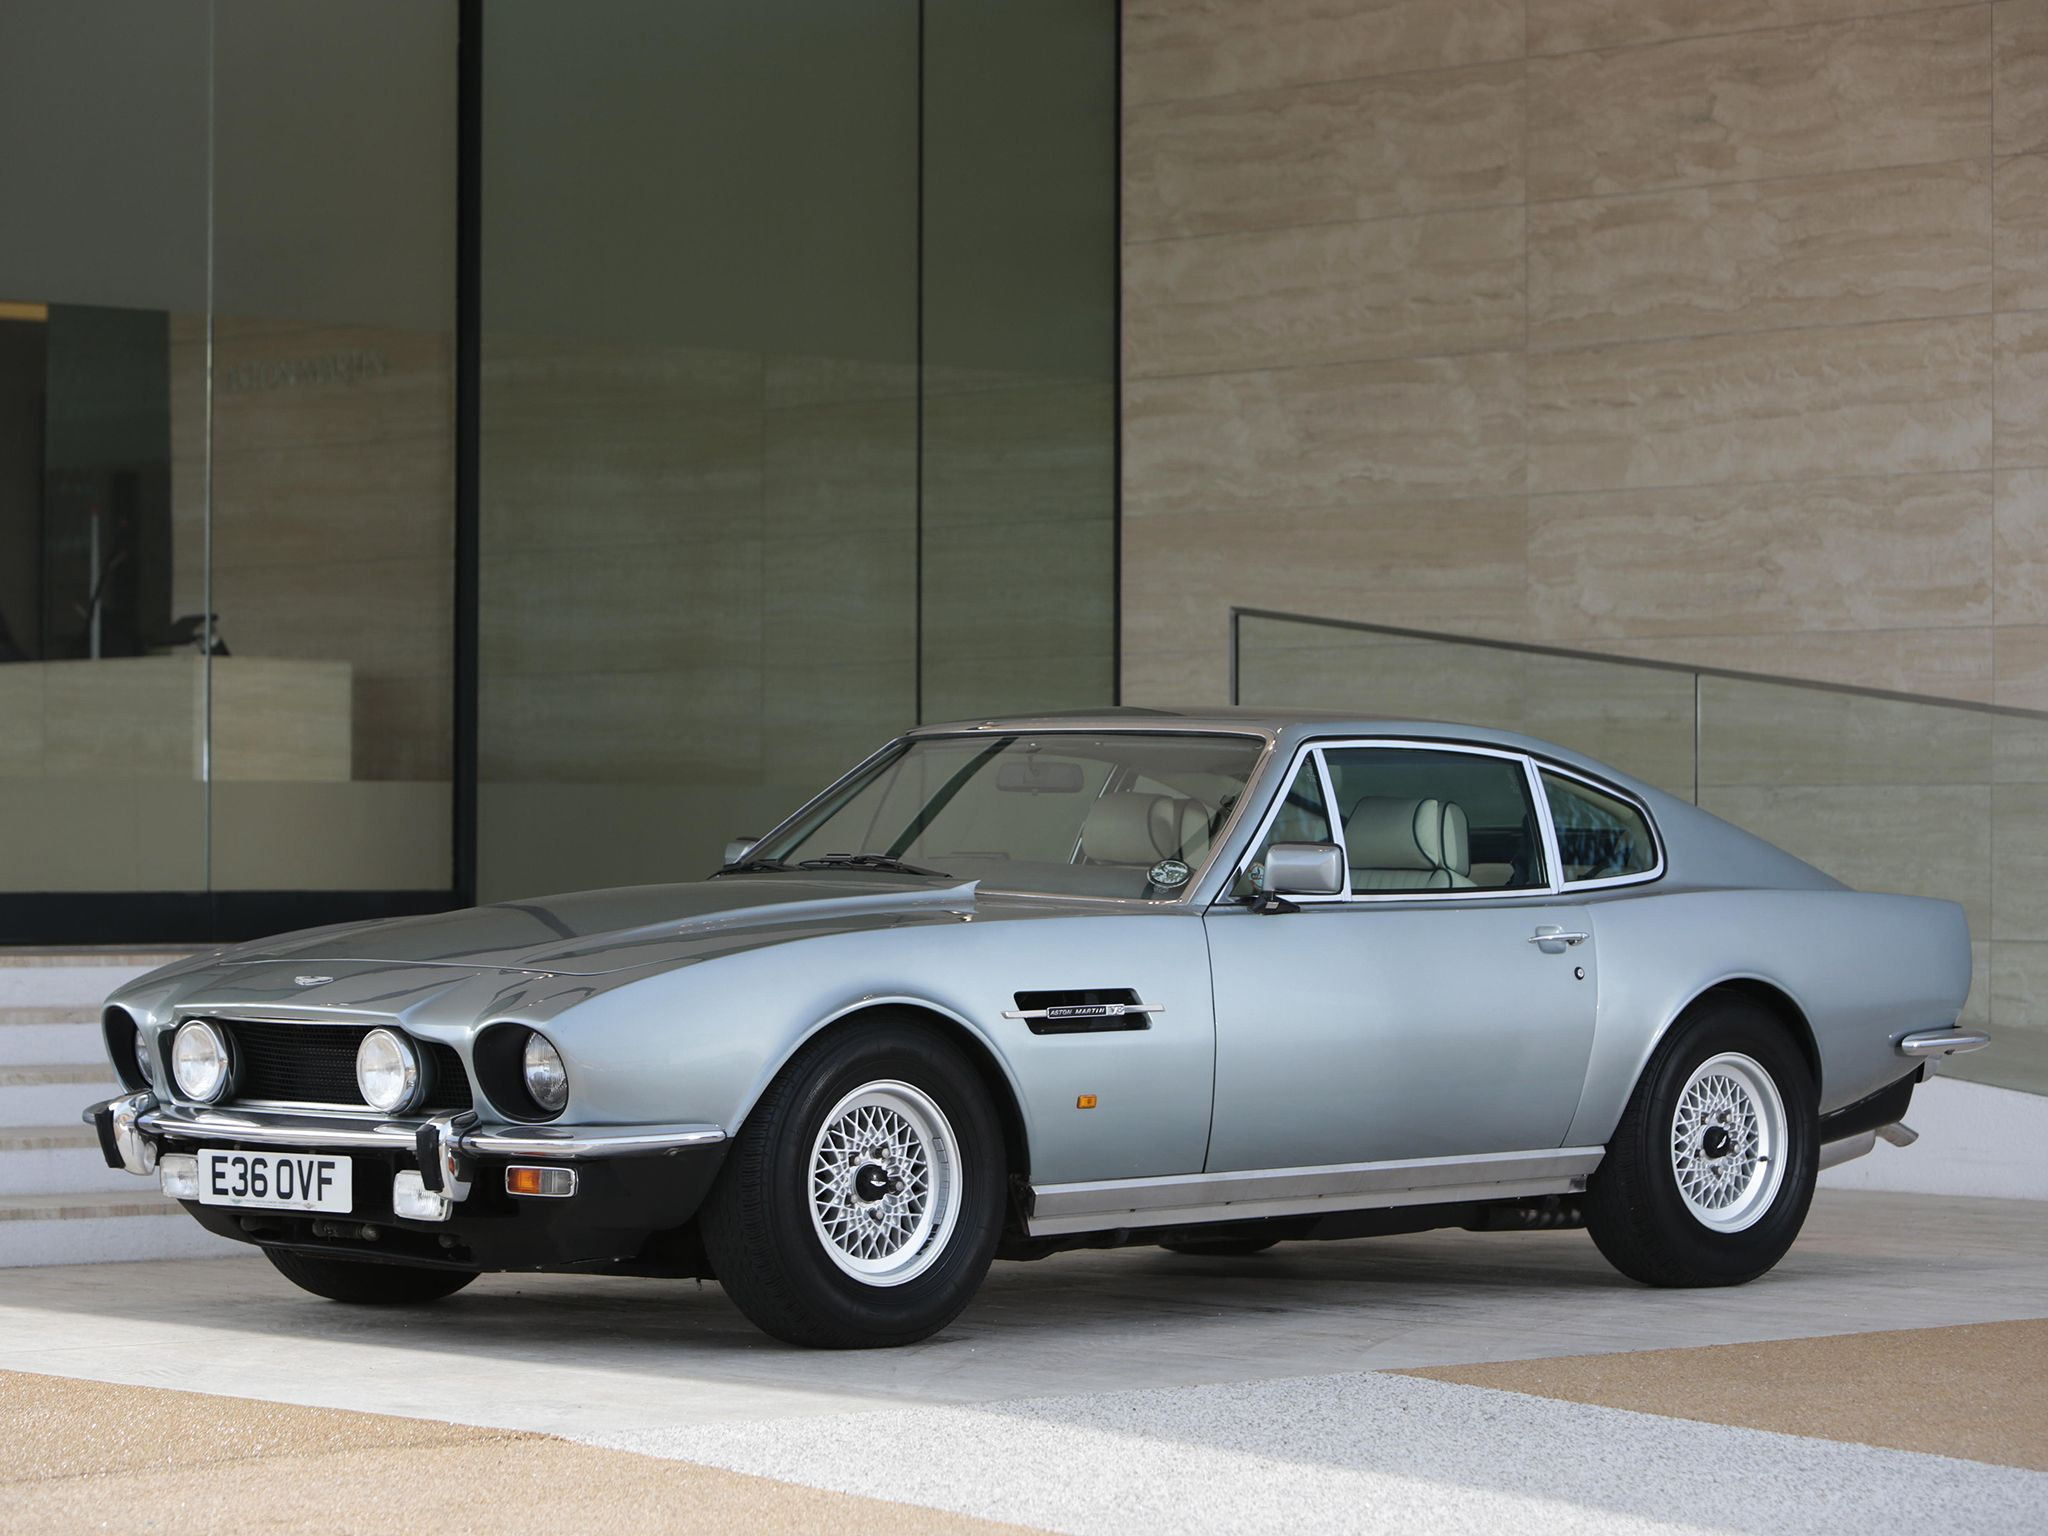 Aston Martin V8 Aston Martin Cars Classic Aston Martin Aston Martin V8